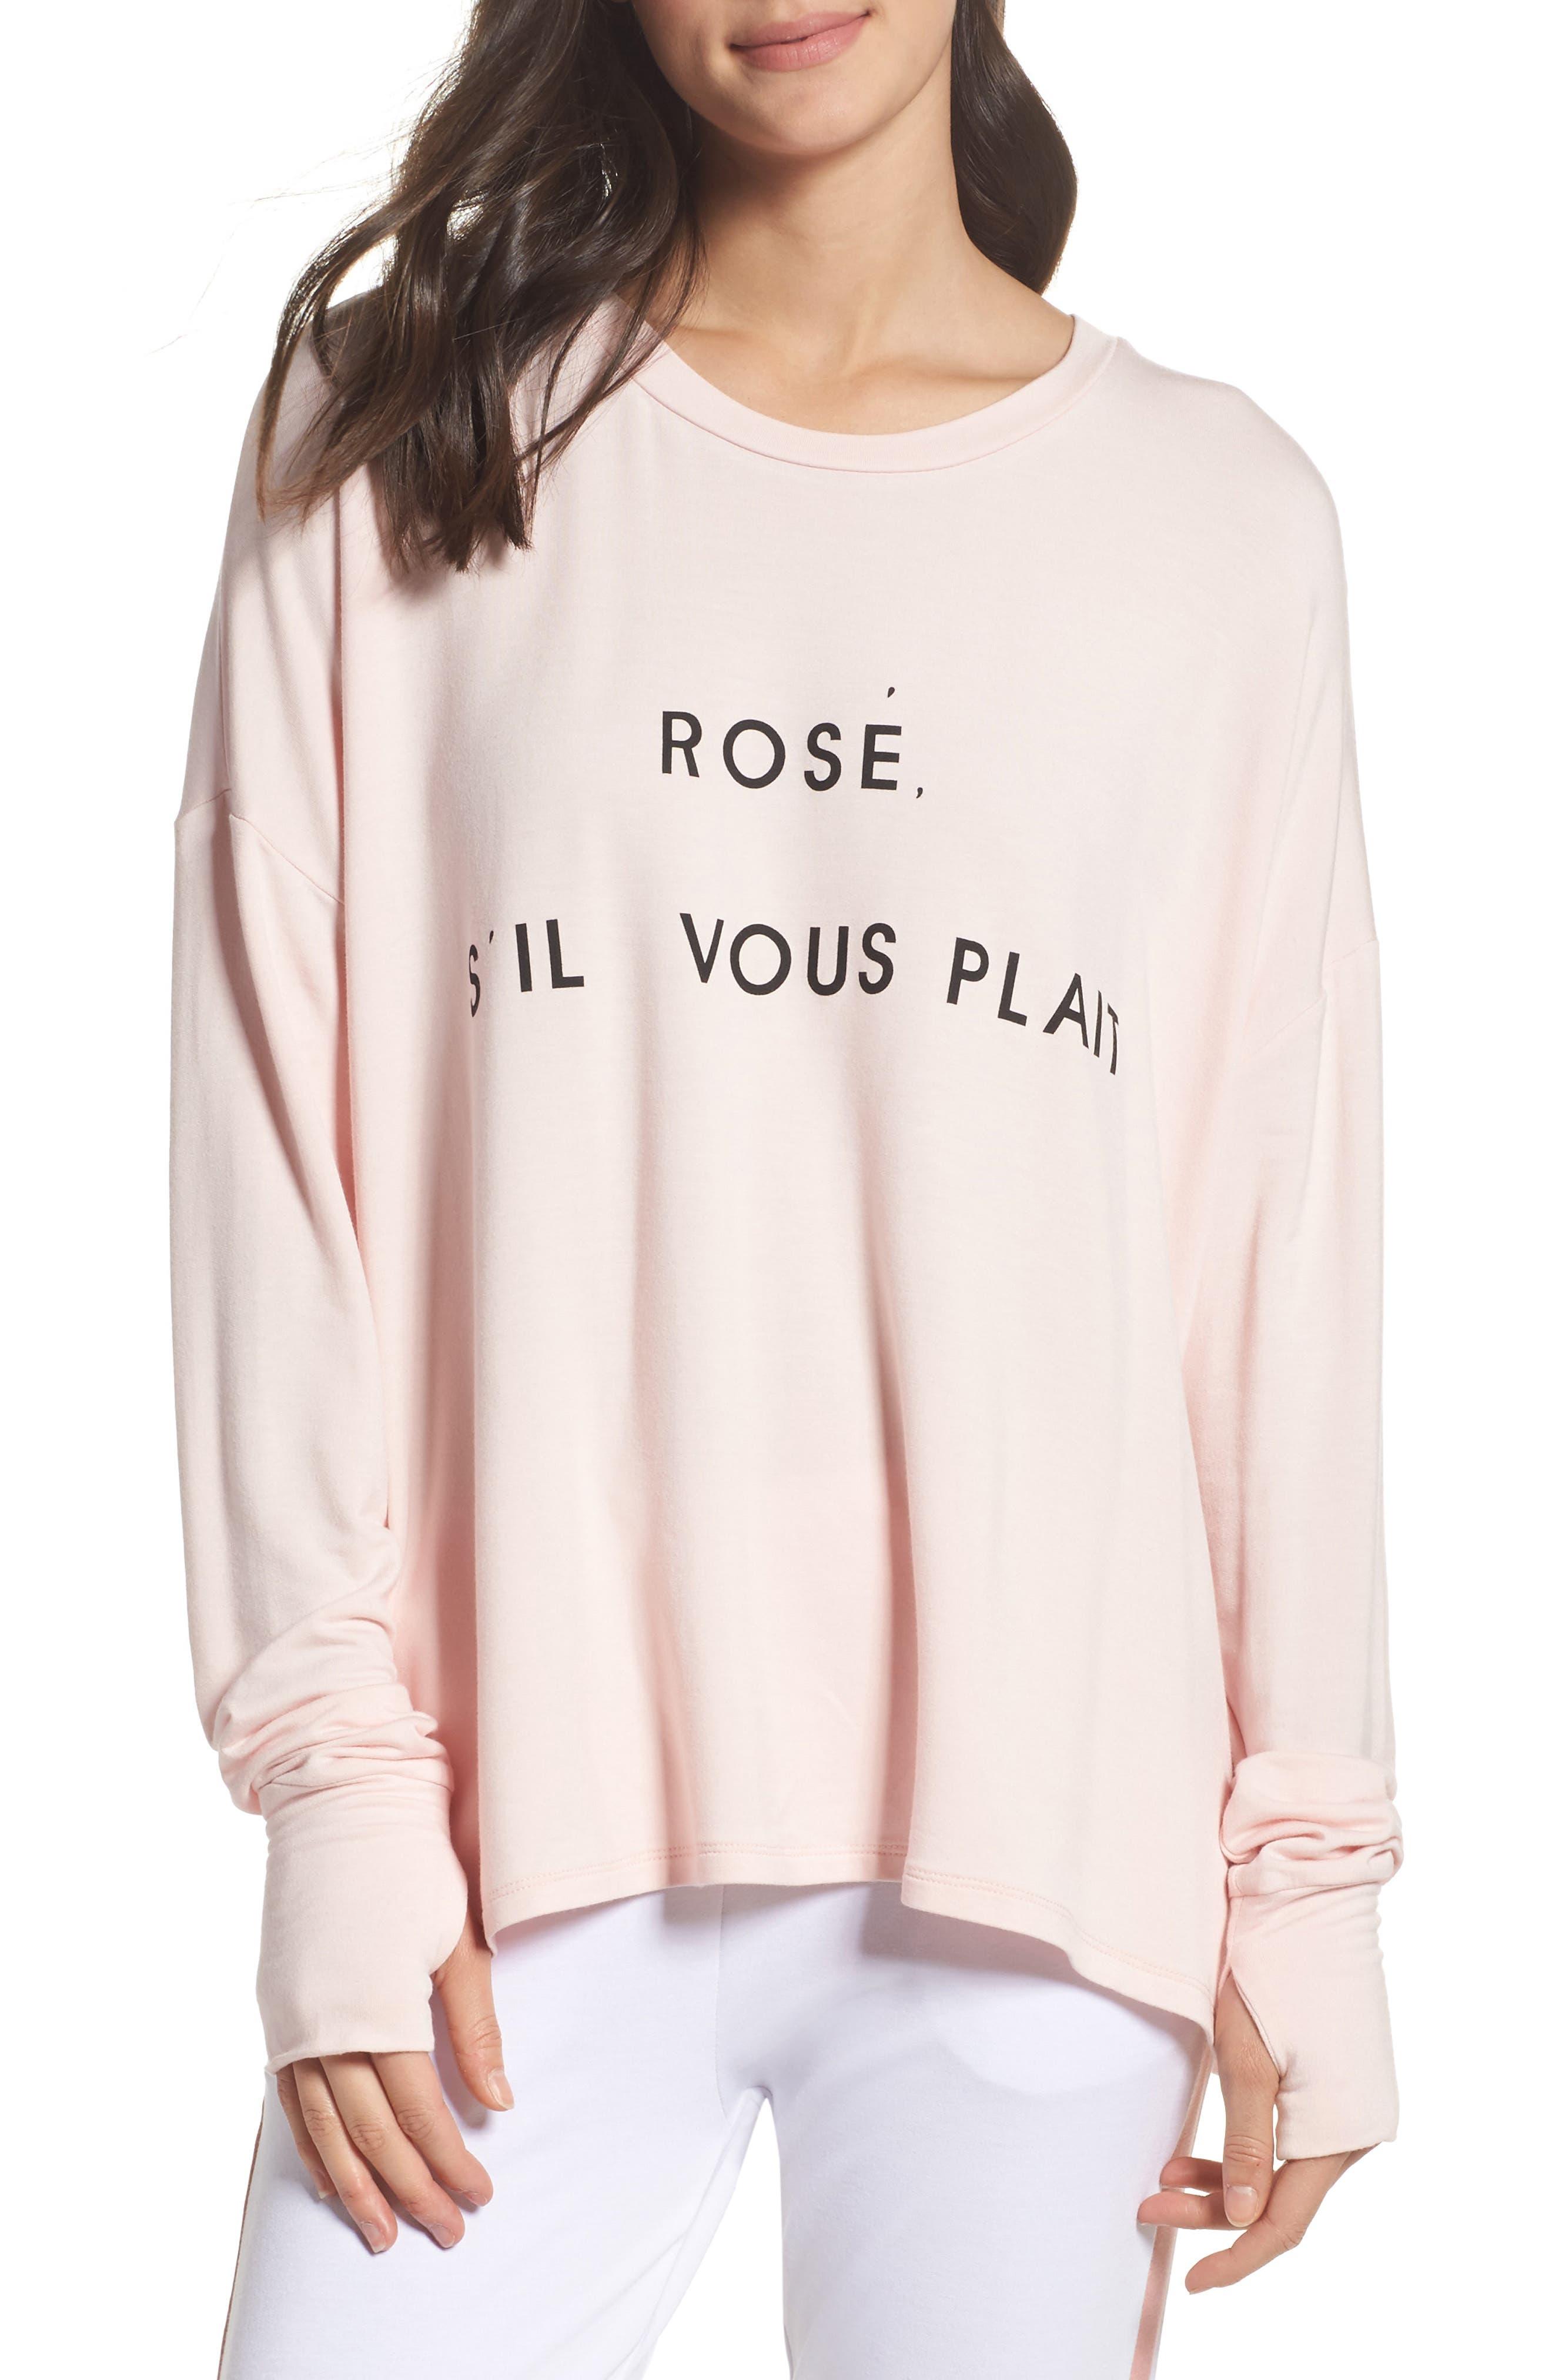 Rosé Please Sweatshirt,                         Main,                         color, Shell